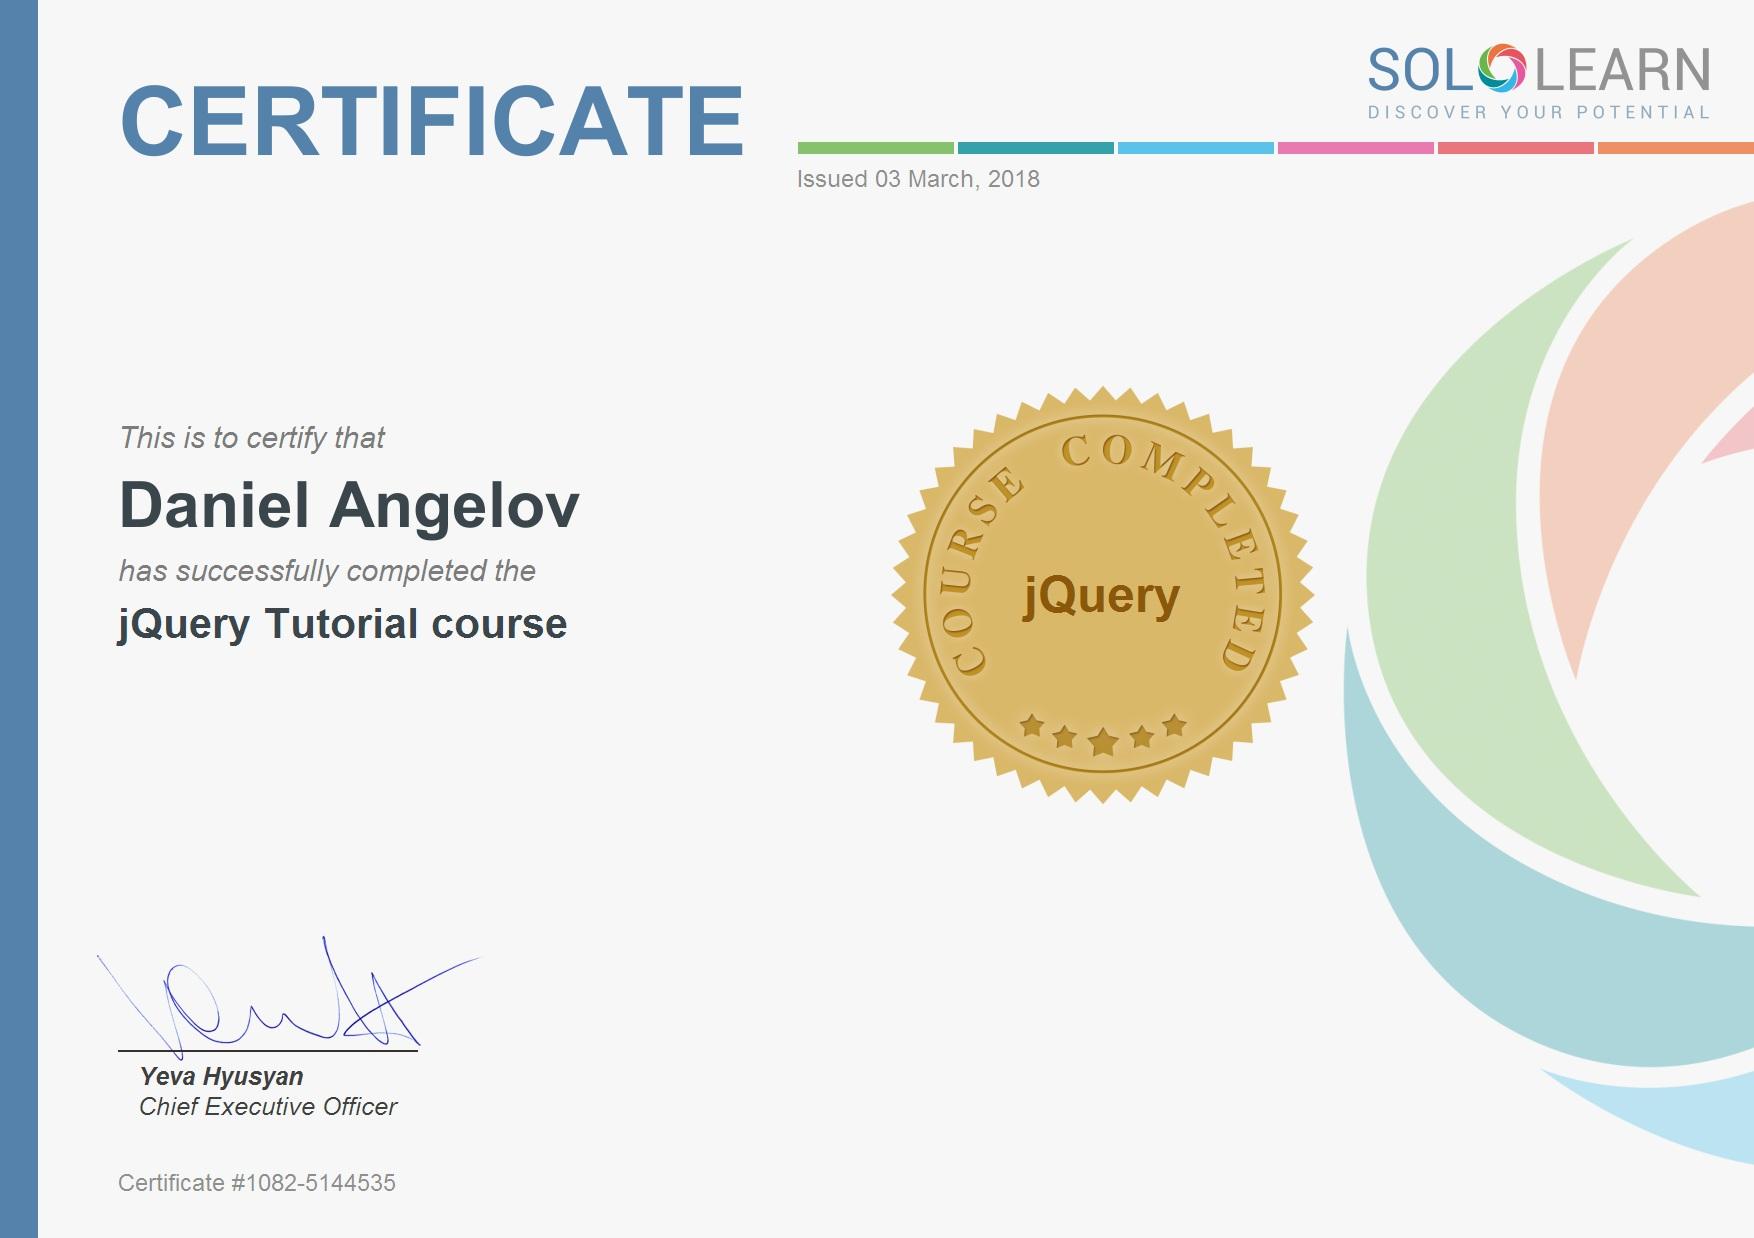 Сертификат на Даниел Ангелов за успешно изкаран курс по jQuery